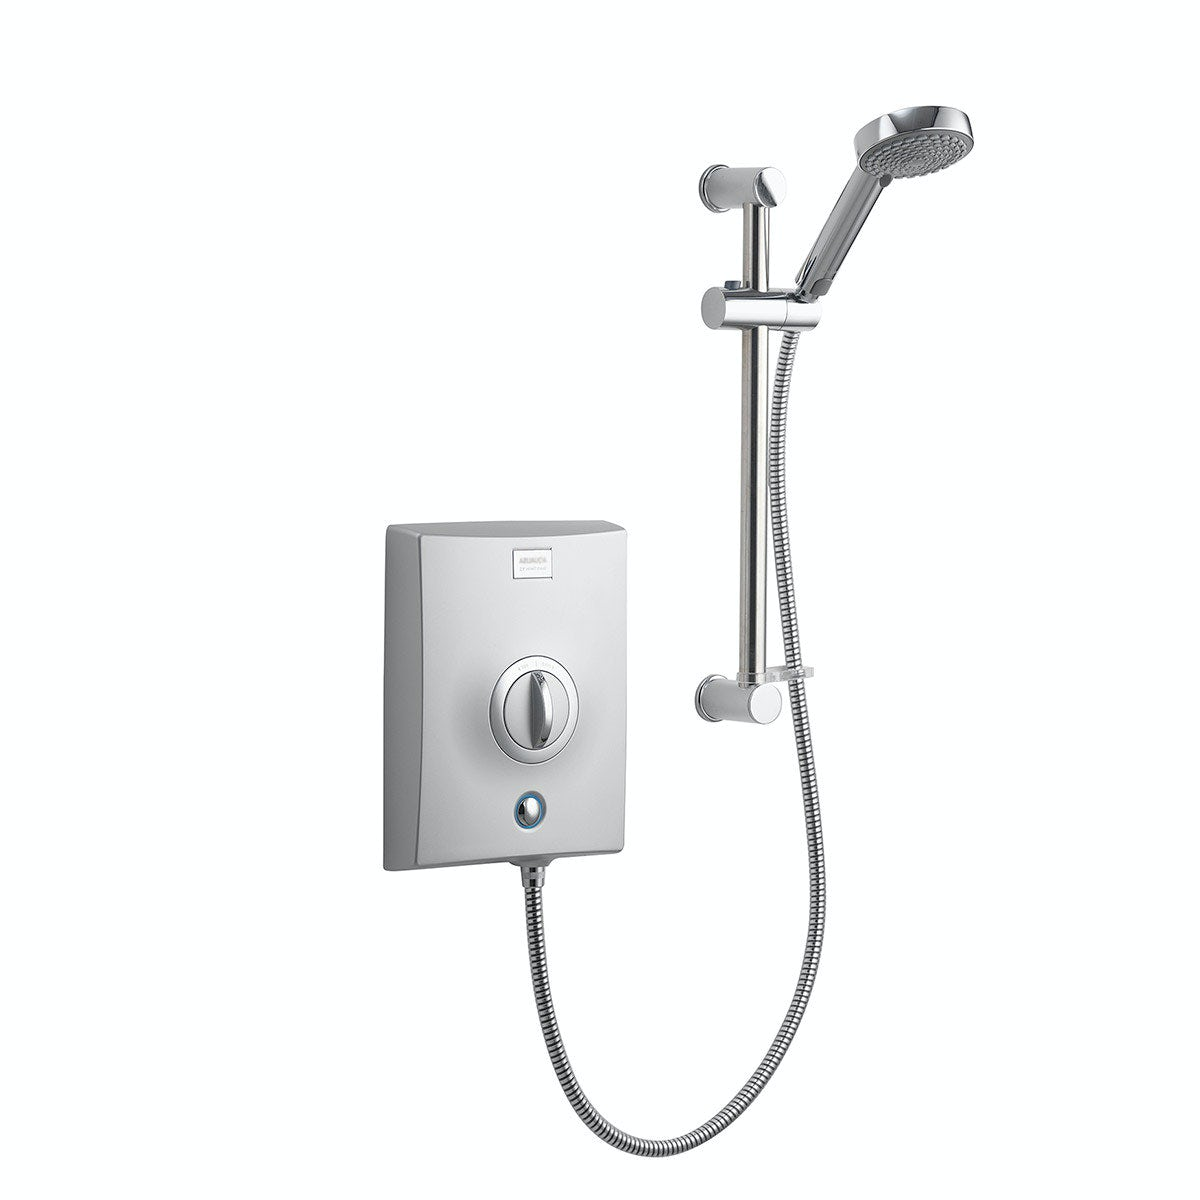 Aqualisa quartz electric shower 8.5kw